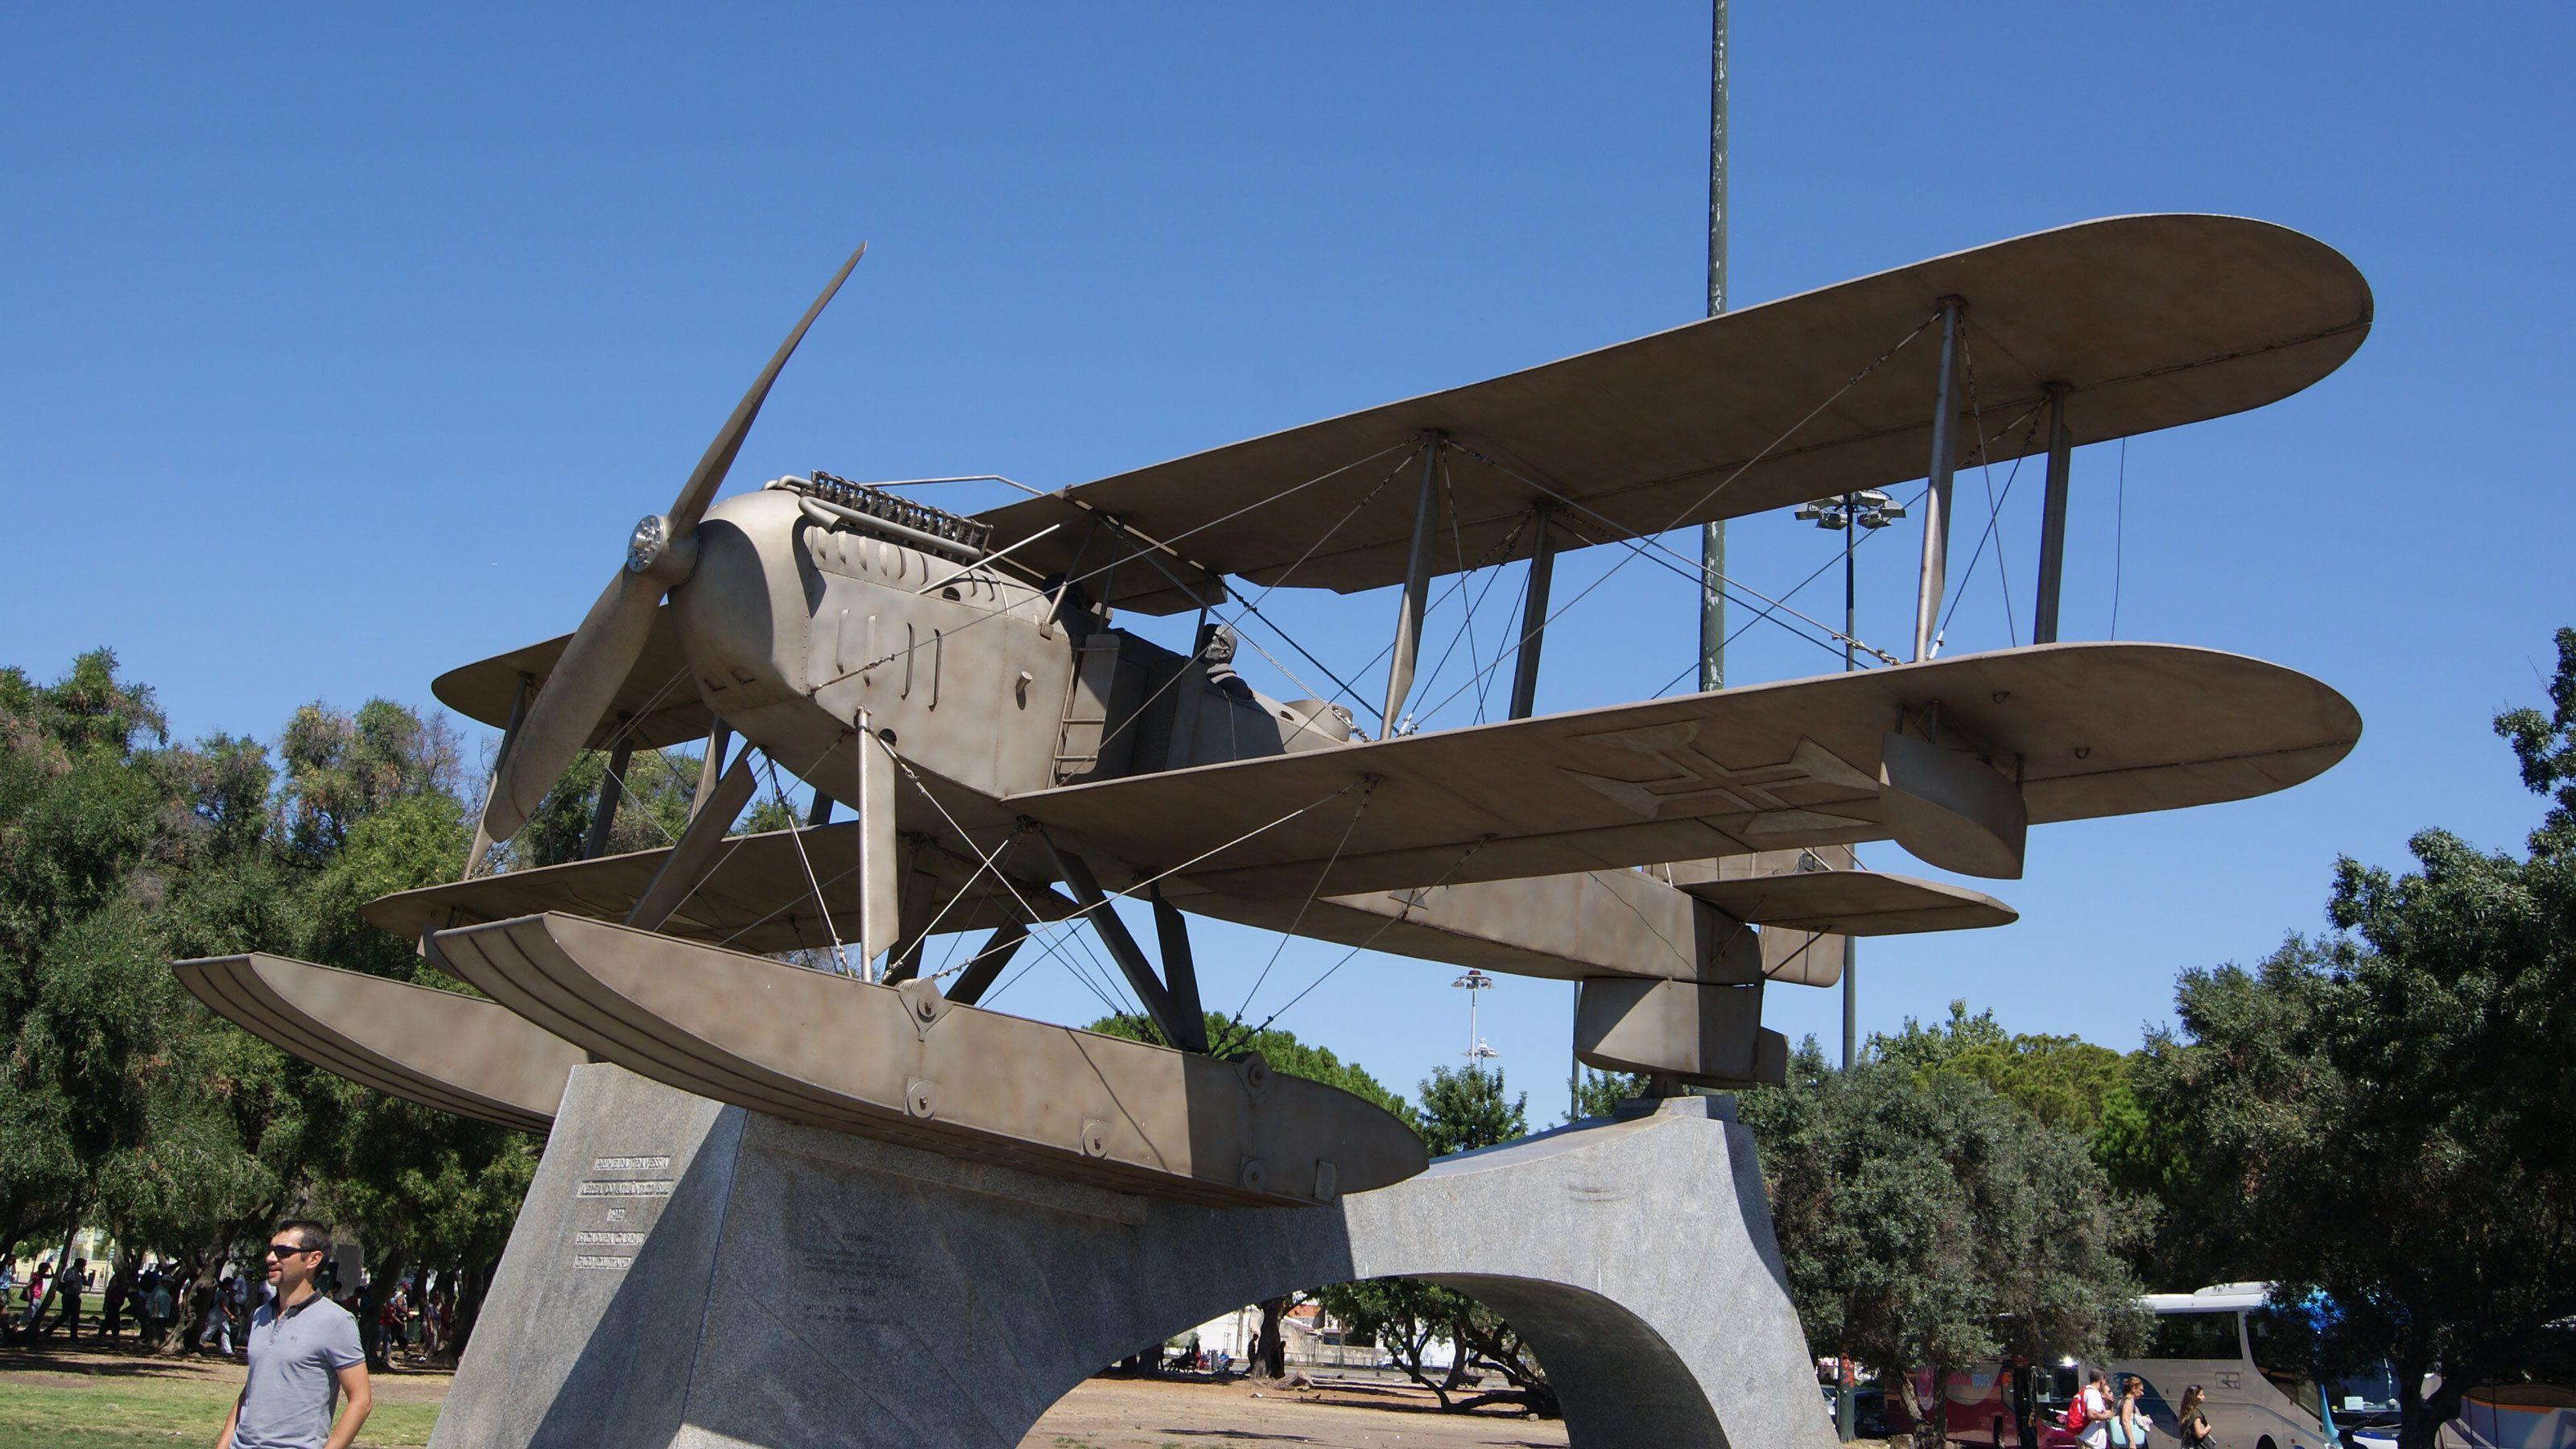 metal plane sculpture in Portugal